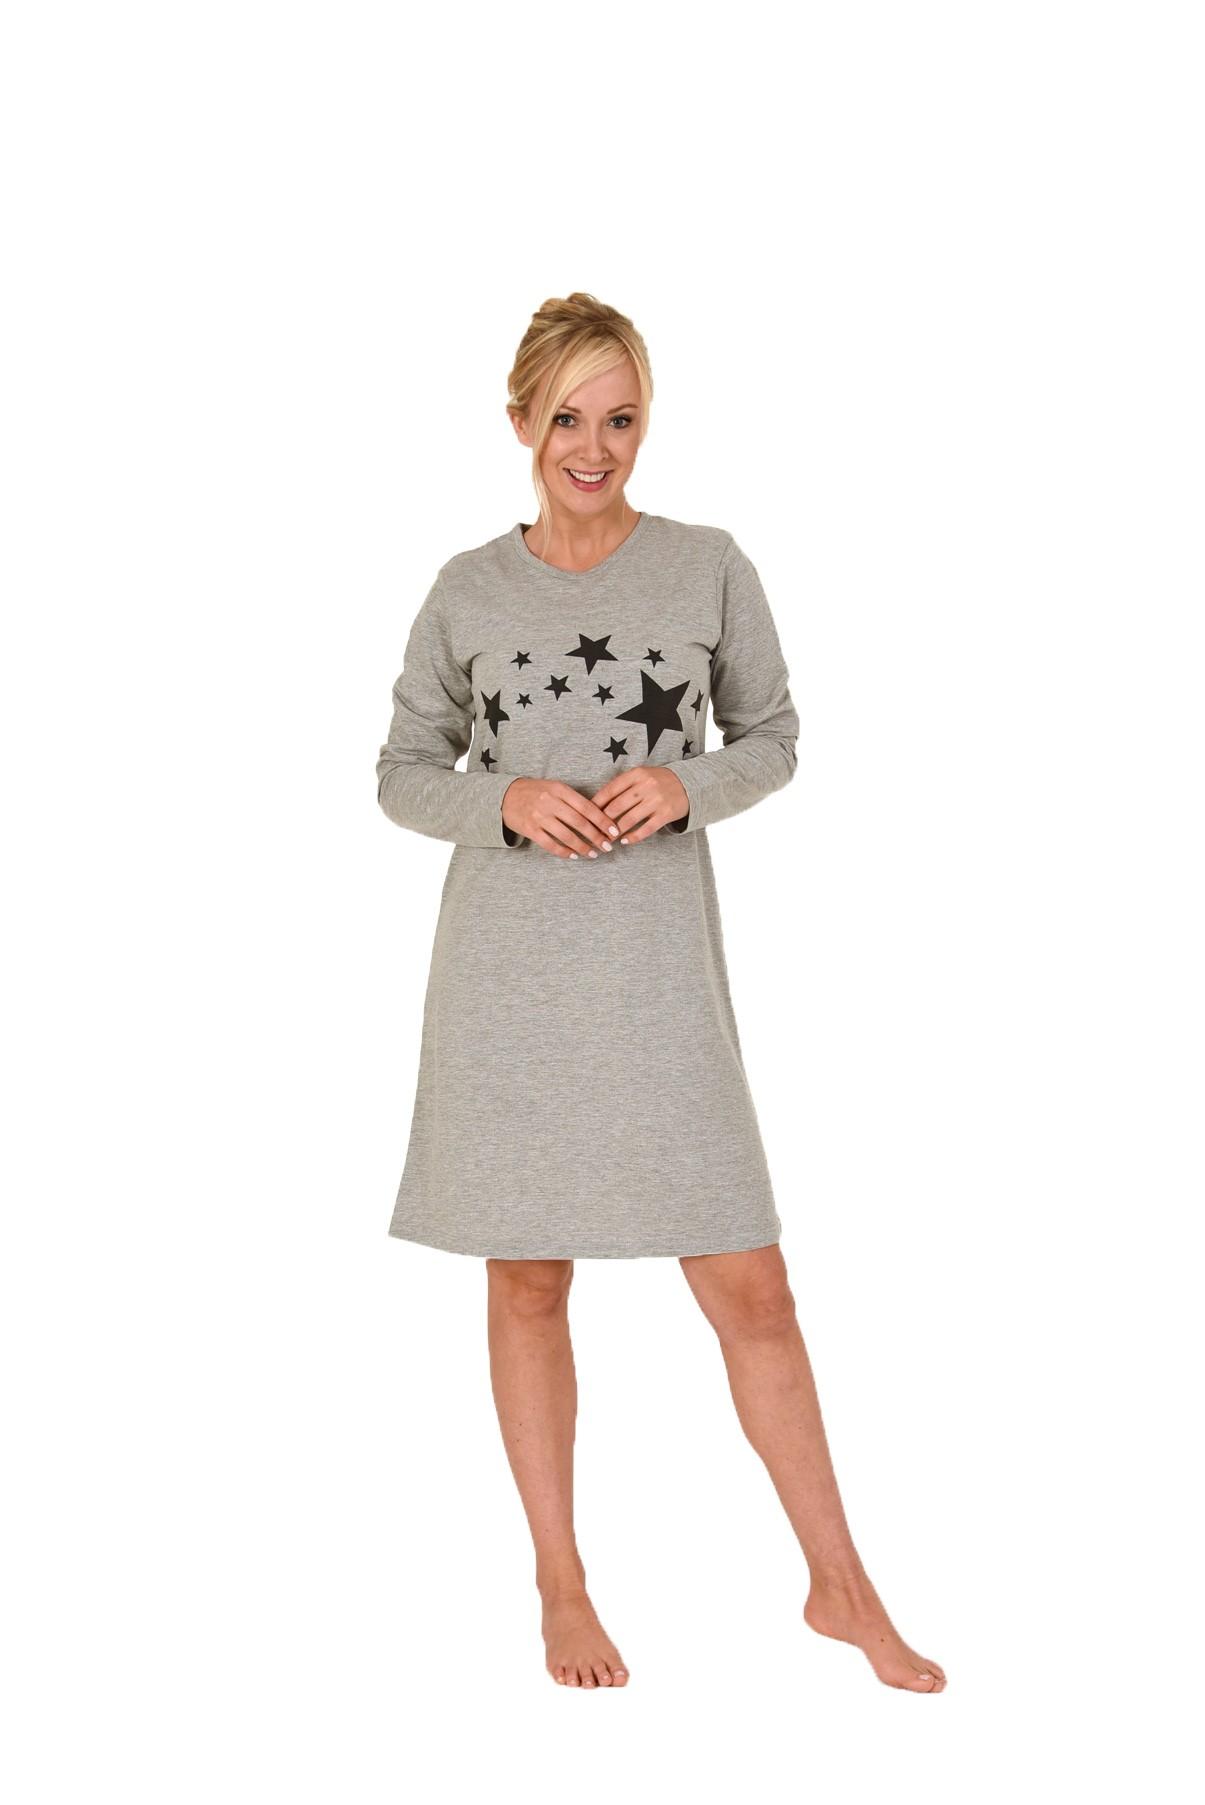 Damen Frottee Nachthemd langarm Bigshirt mit Sternehnmotiv – 58404